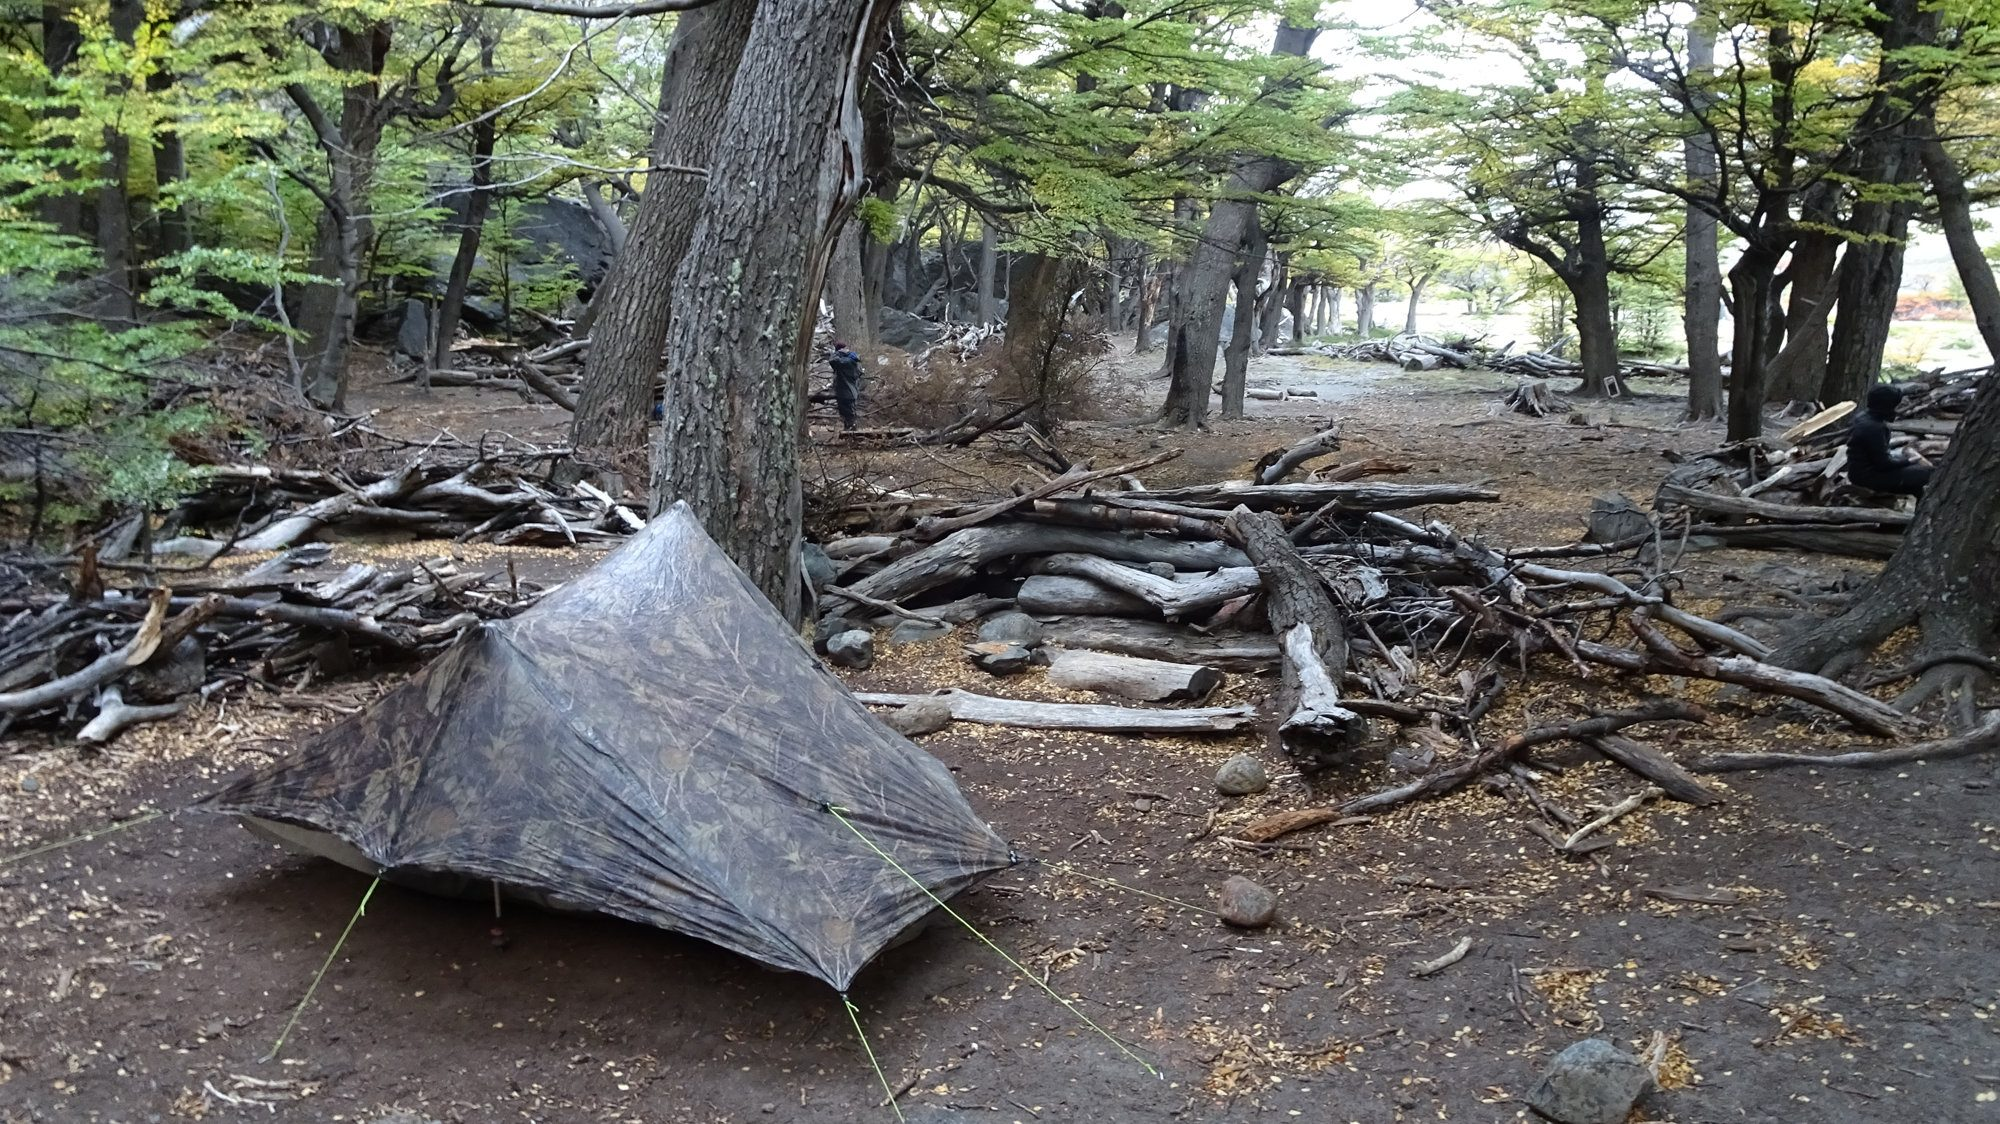 Zelt m Laguna Toro Camping, Huemul Circuit, El Chaltén, Patagonien, Argentinien, Wanderung, Trekking